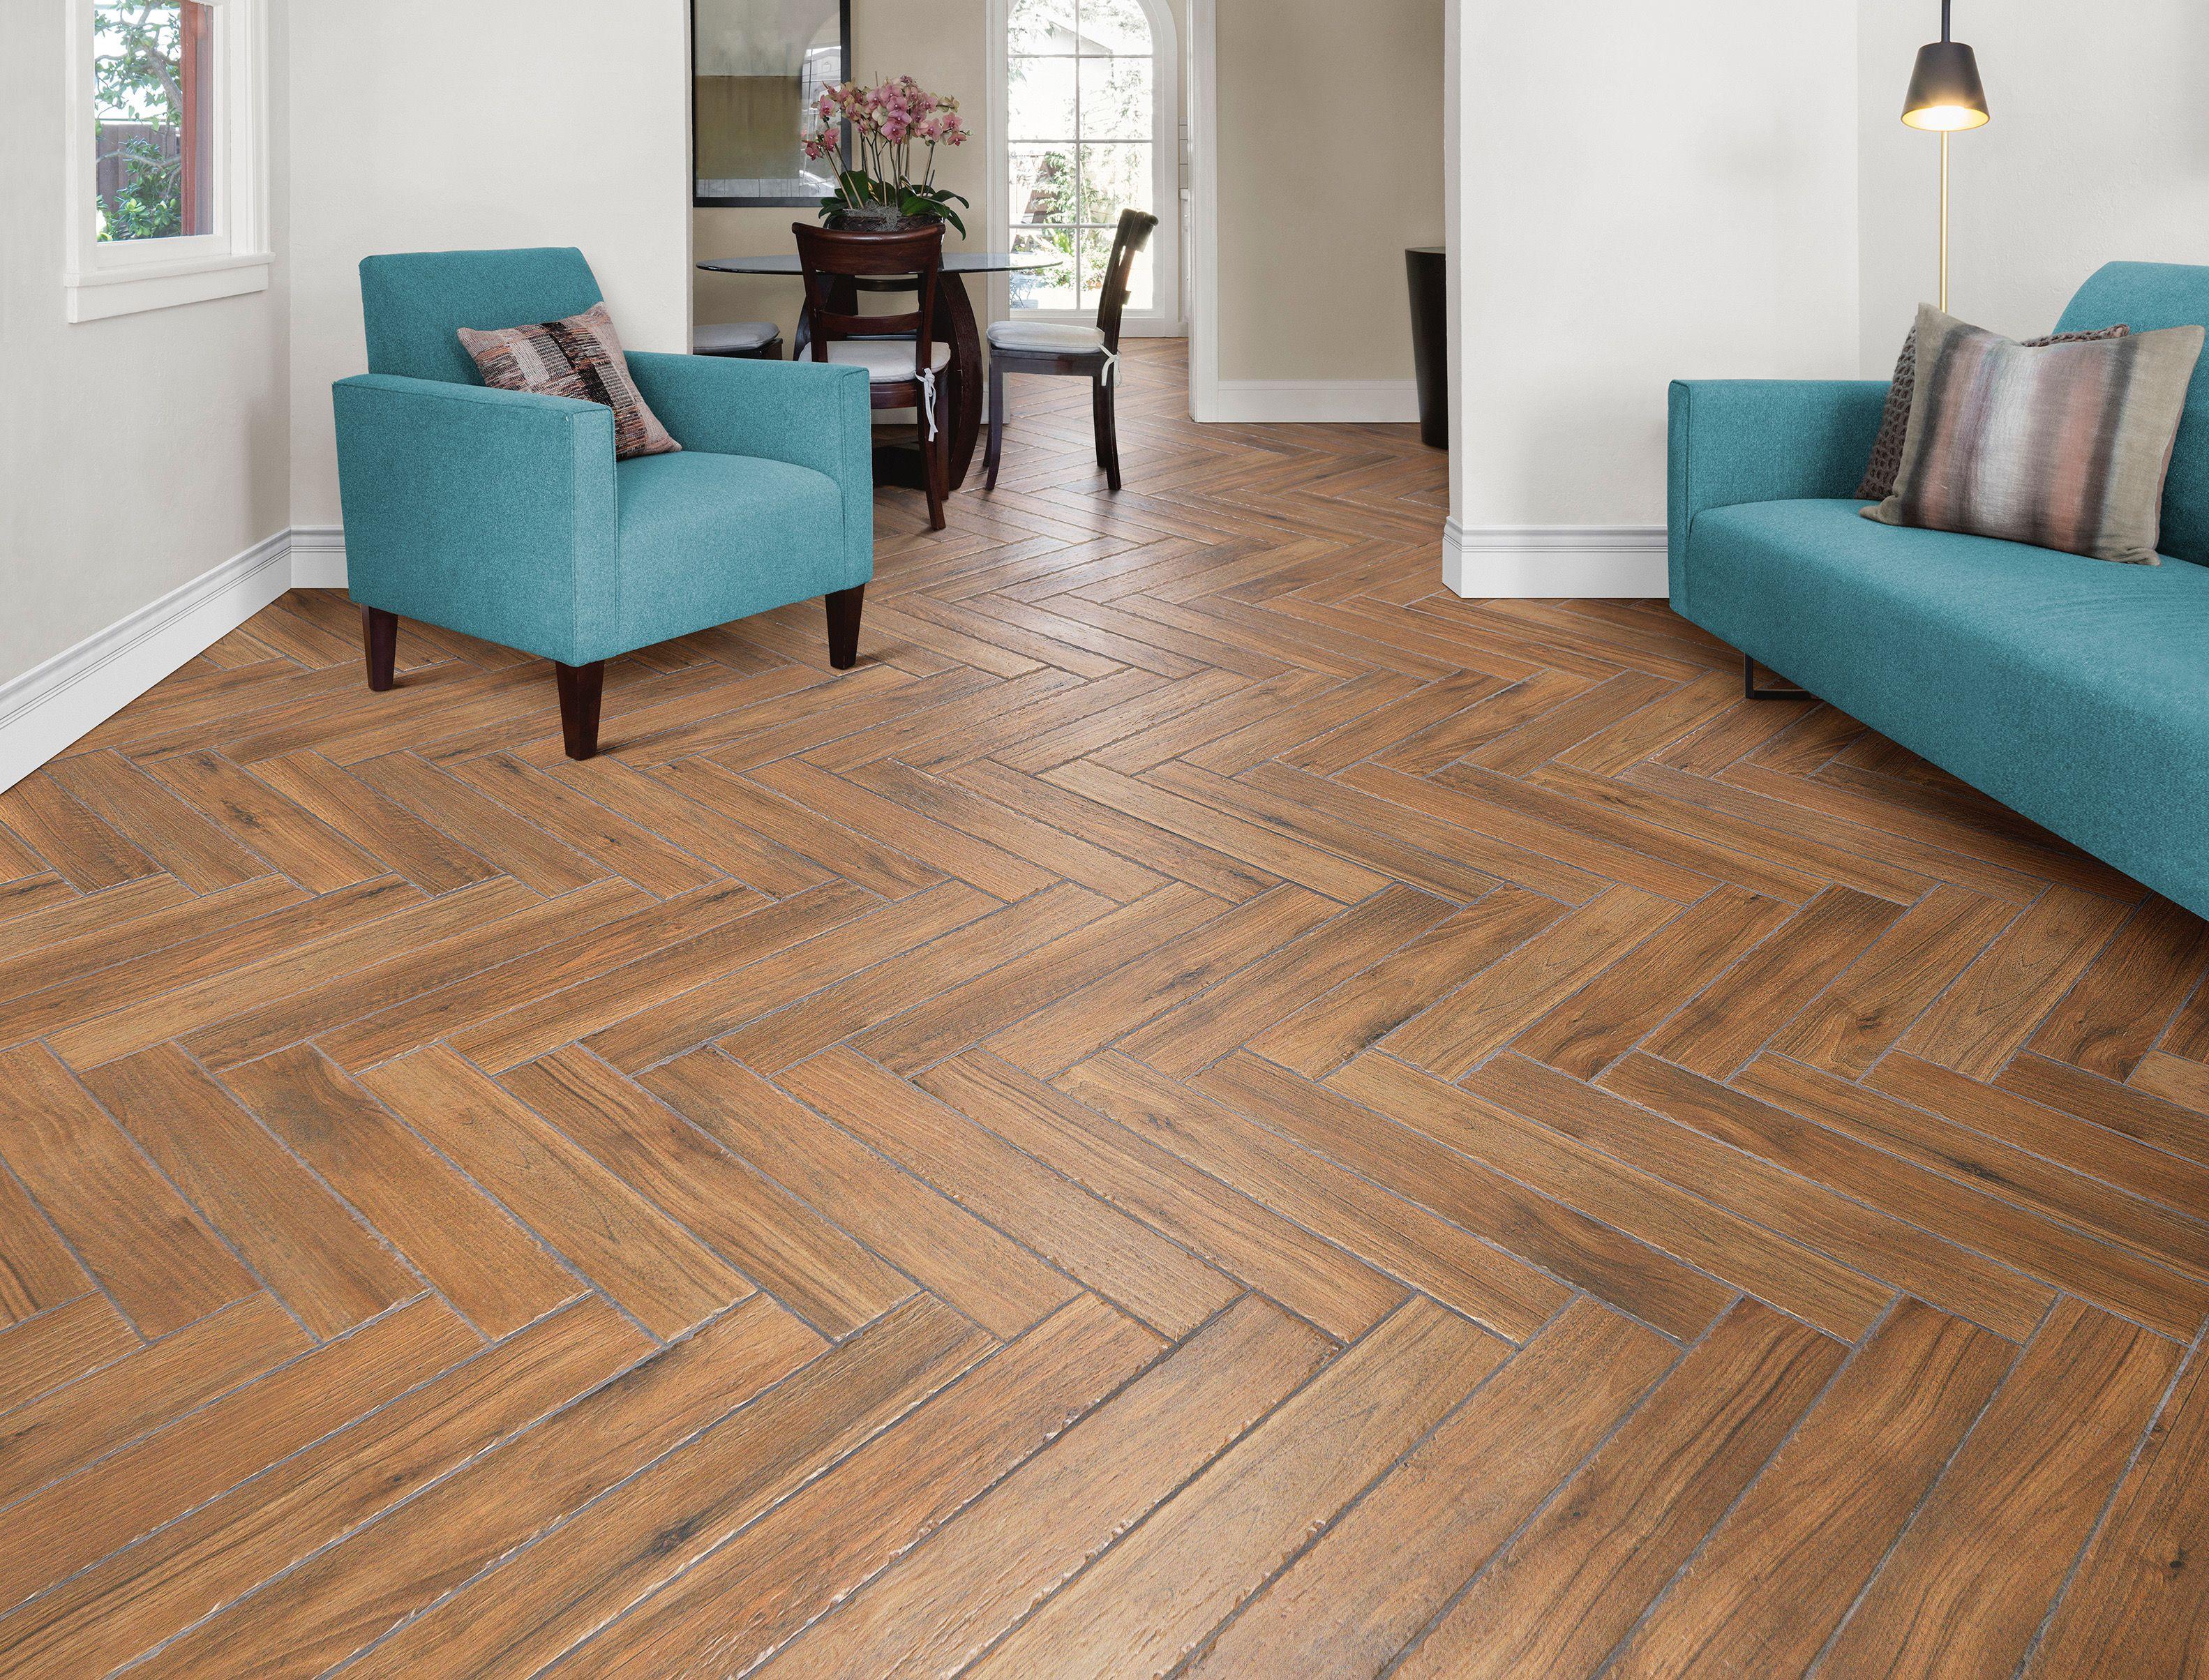 Serie ETERNA De NATUCER Madera Porcelanico X Color Eterna - Eterna hardwood flooring